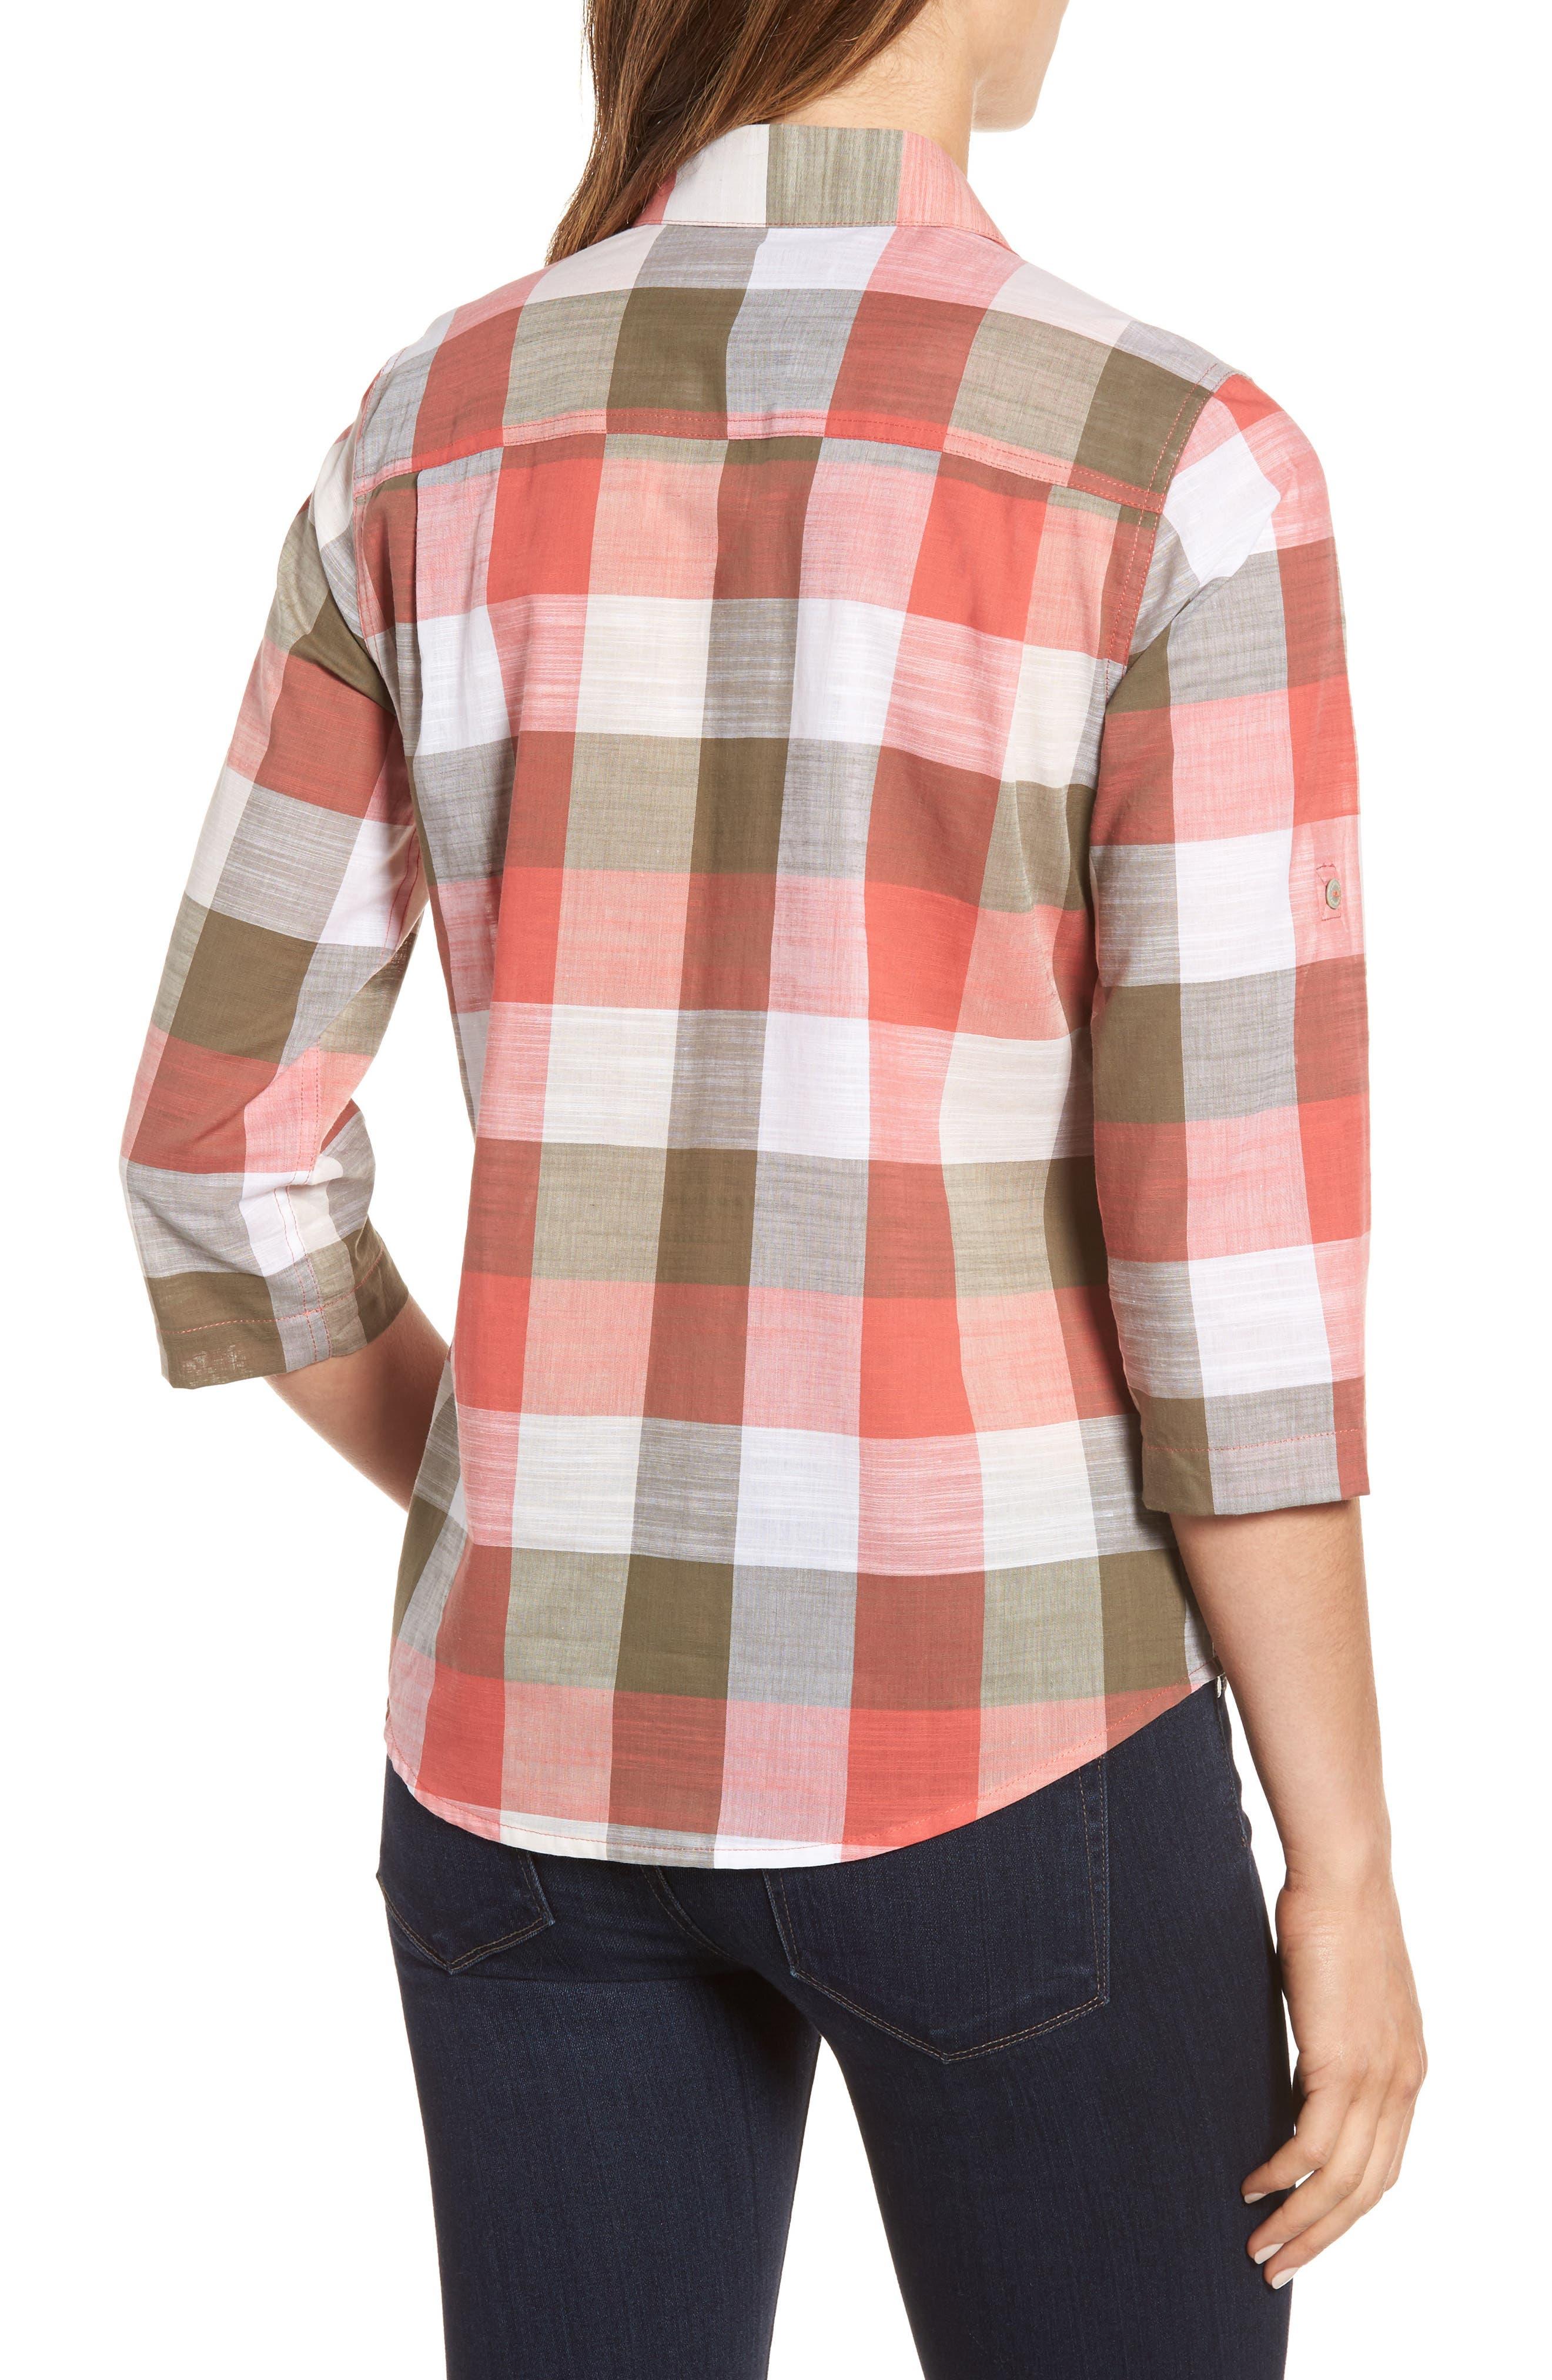 Reese Buffalo Check Shirt,                             Alternate thumbnail 2, color,                             360